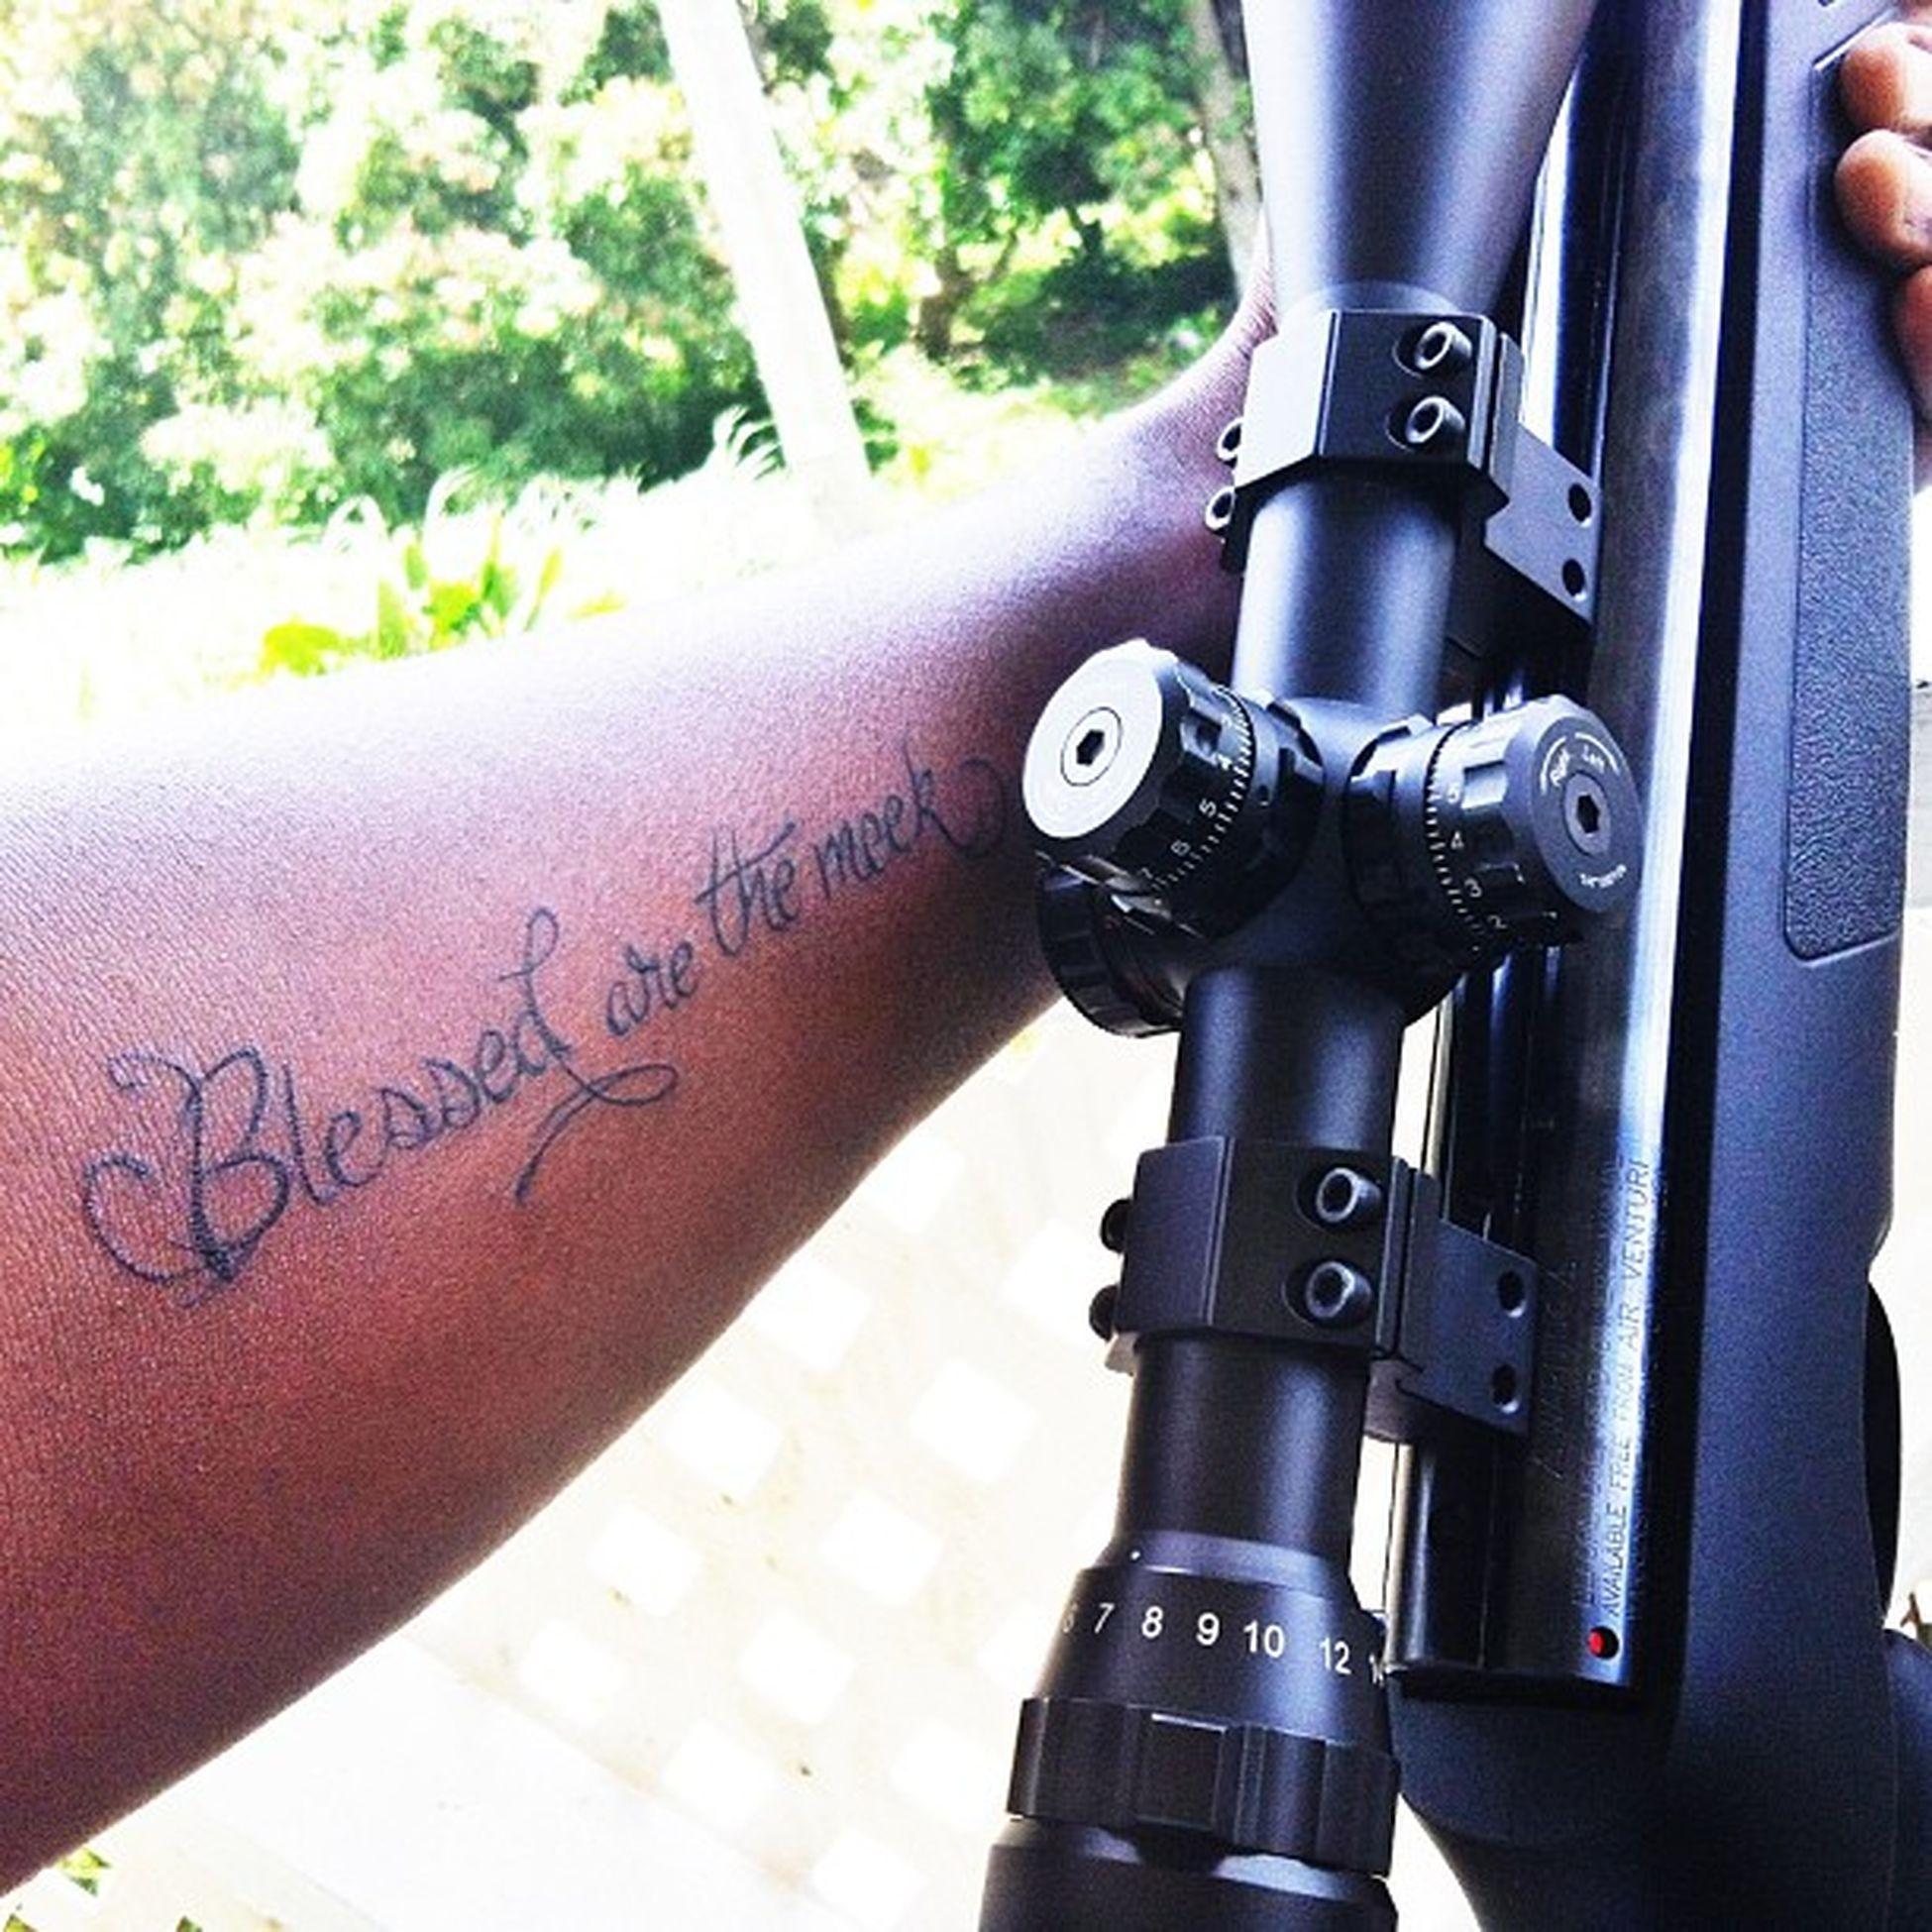 Rifle Gun Hunt Point22 Scope Sniper Mildot German Hw97k Grenada Realtree Camo